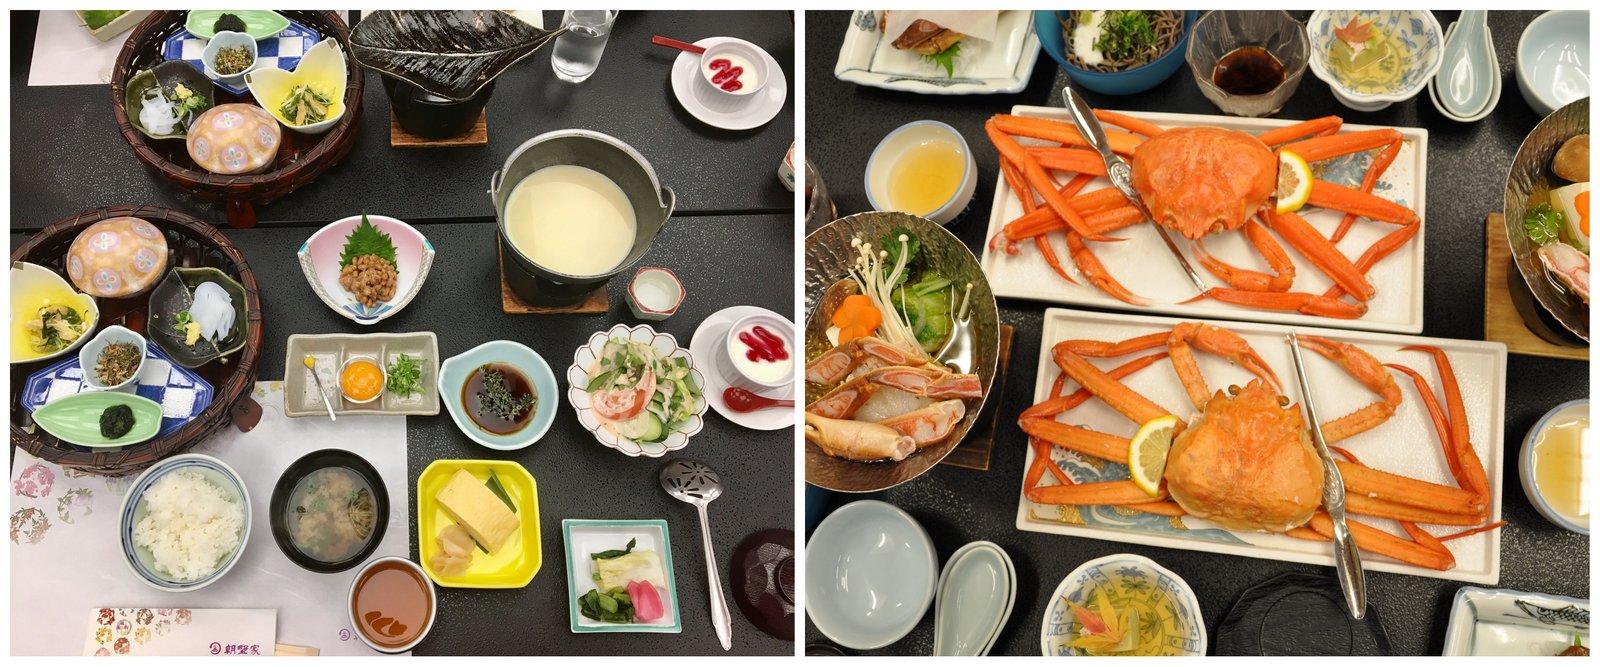 Cuisine kaiseki au Japon